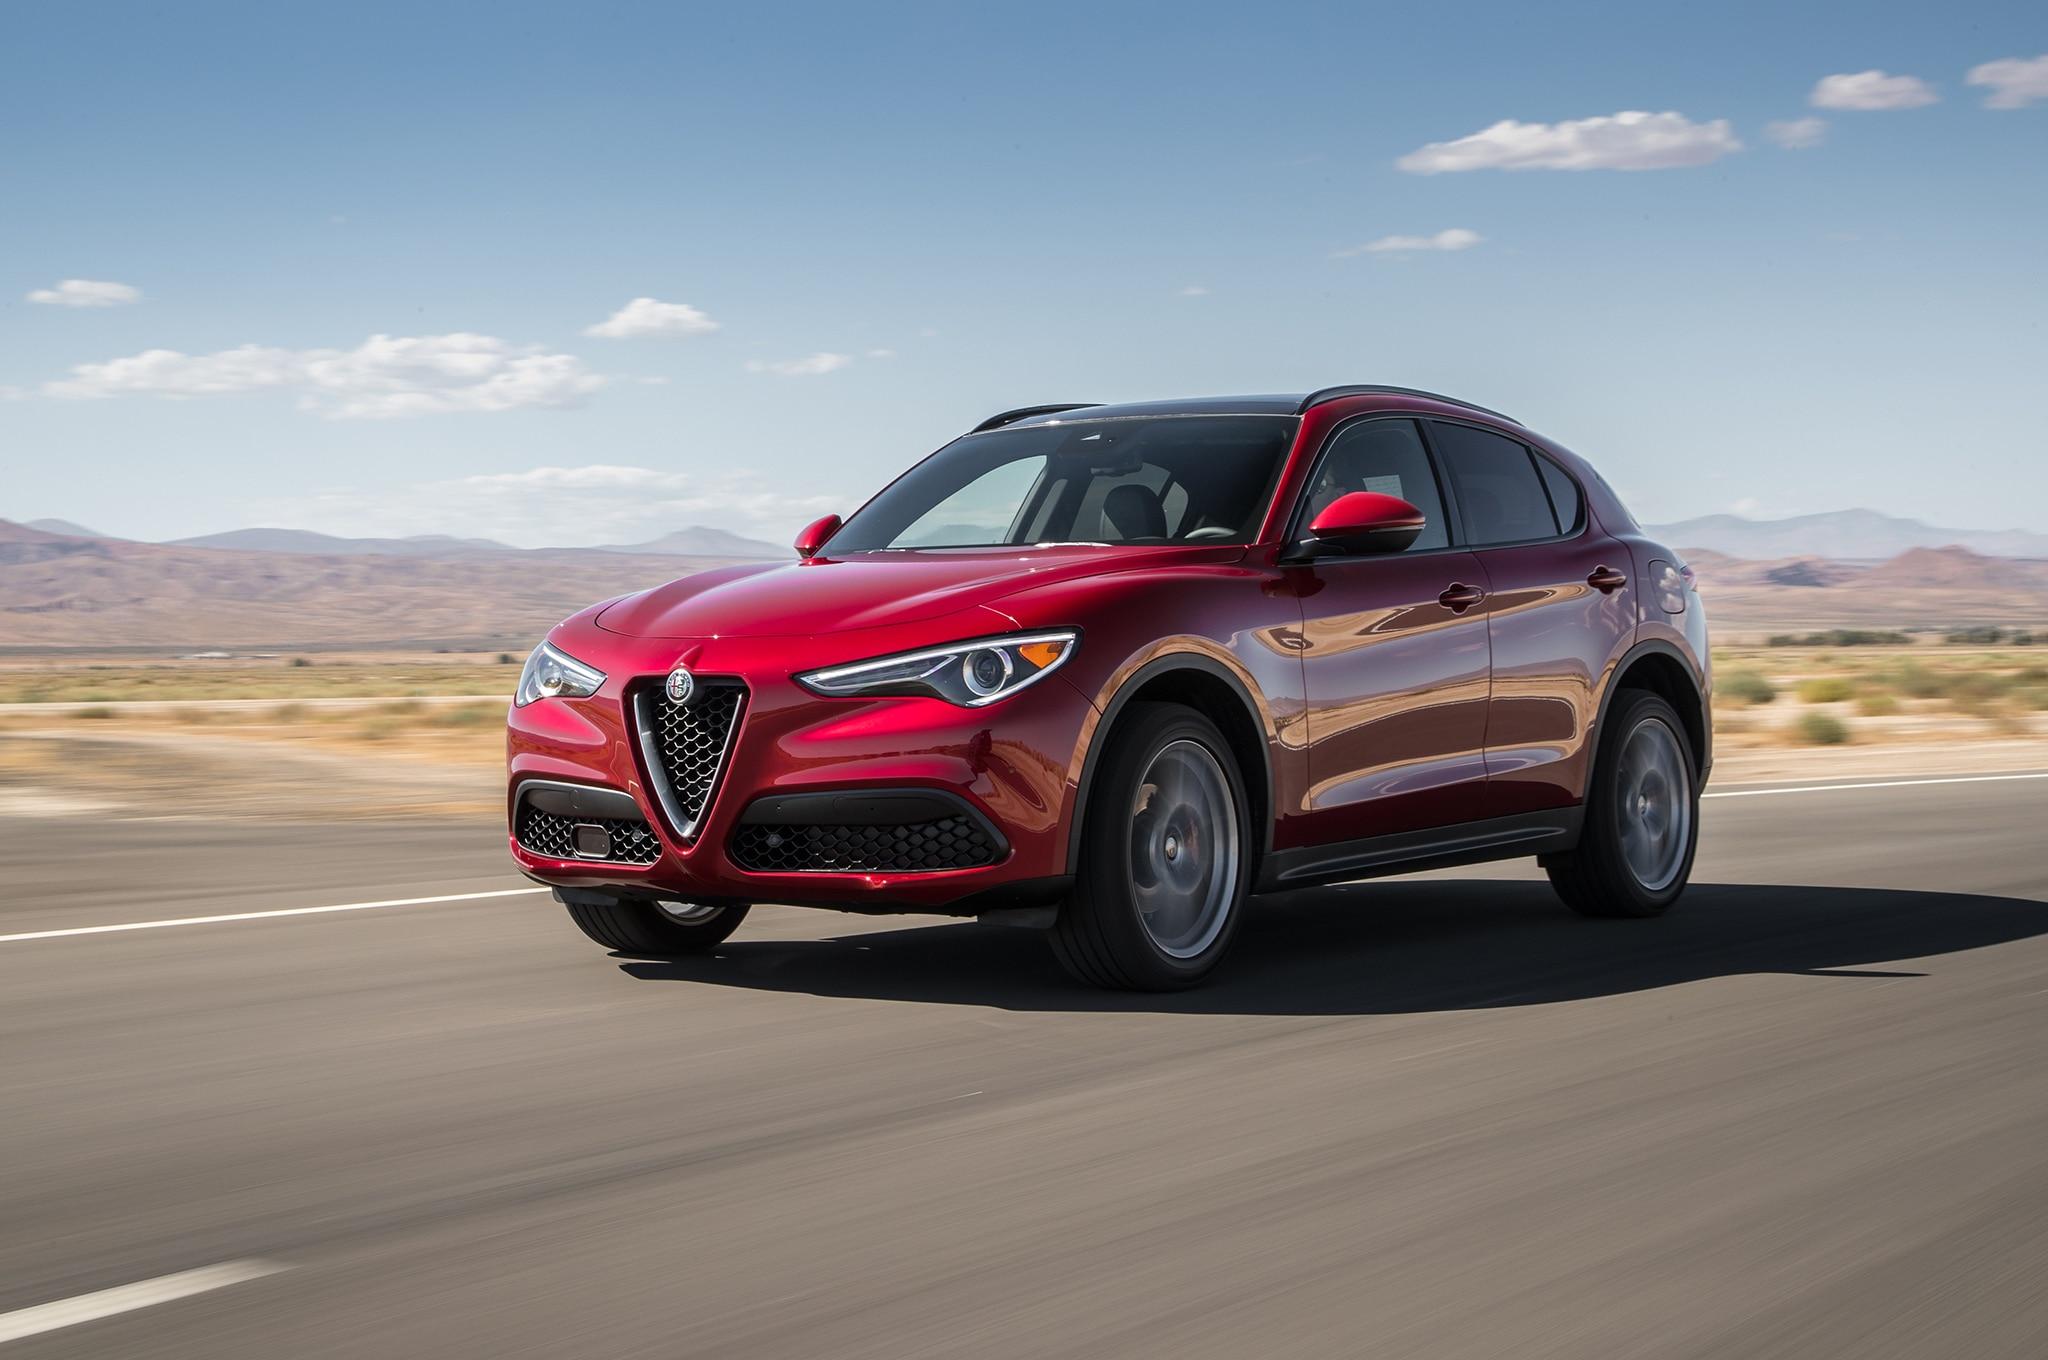 2018 Alfa Romeo Stelvio Ti Front Three Quarter In Motion 05 1